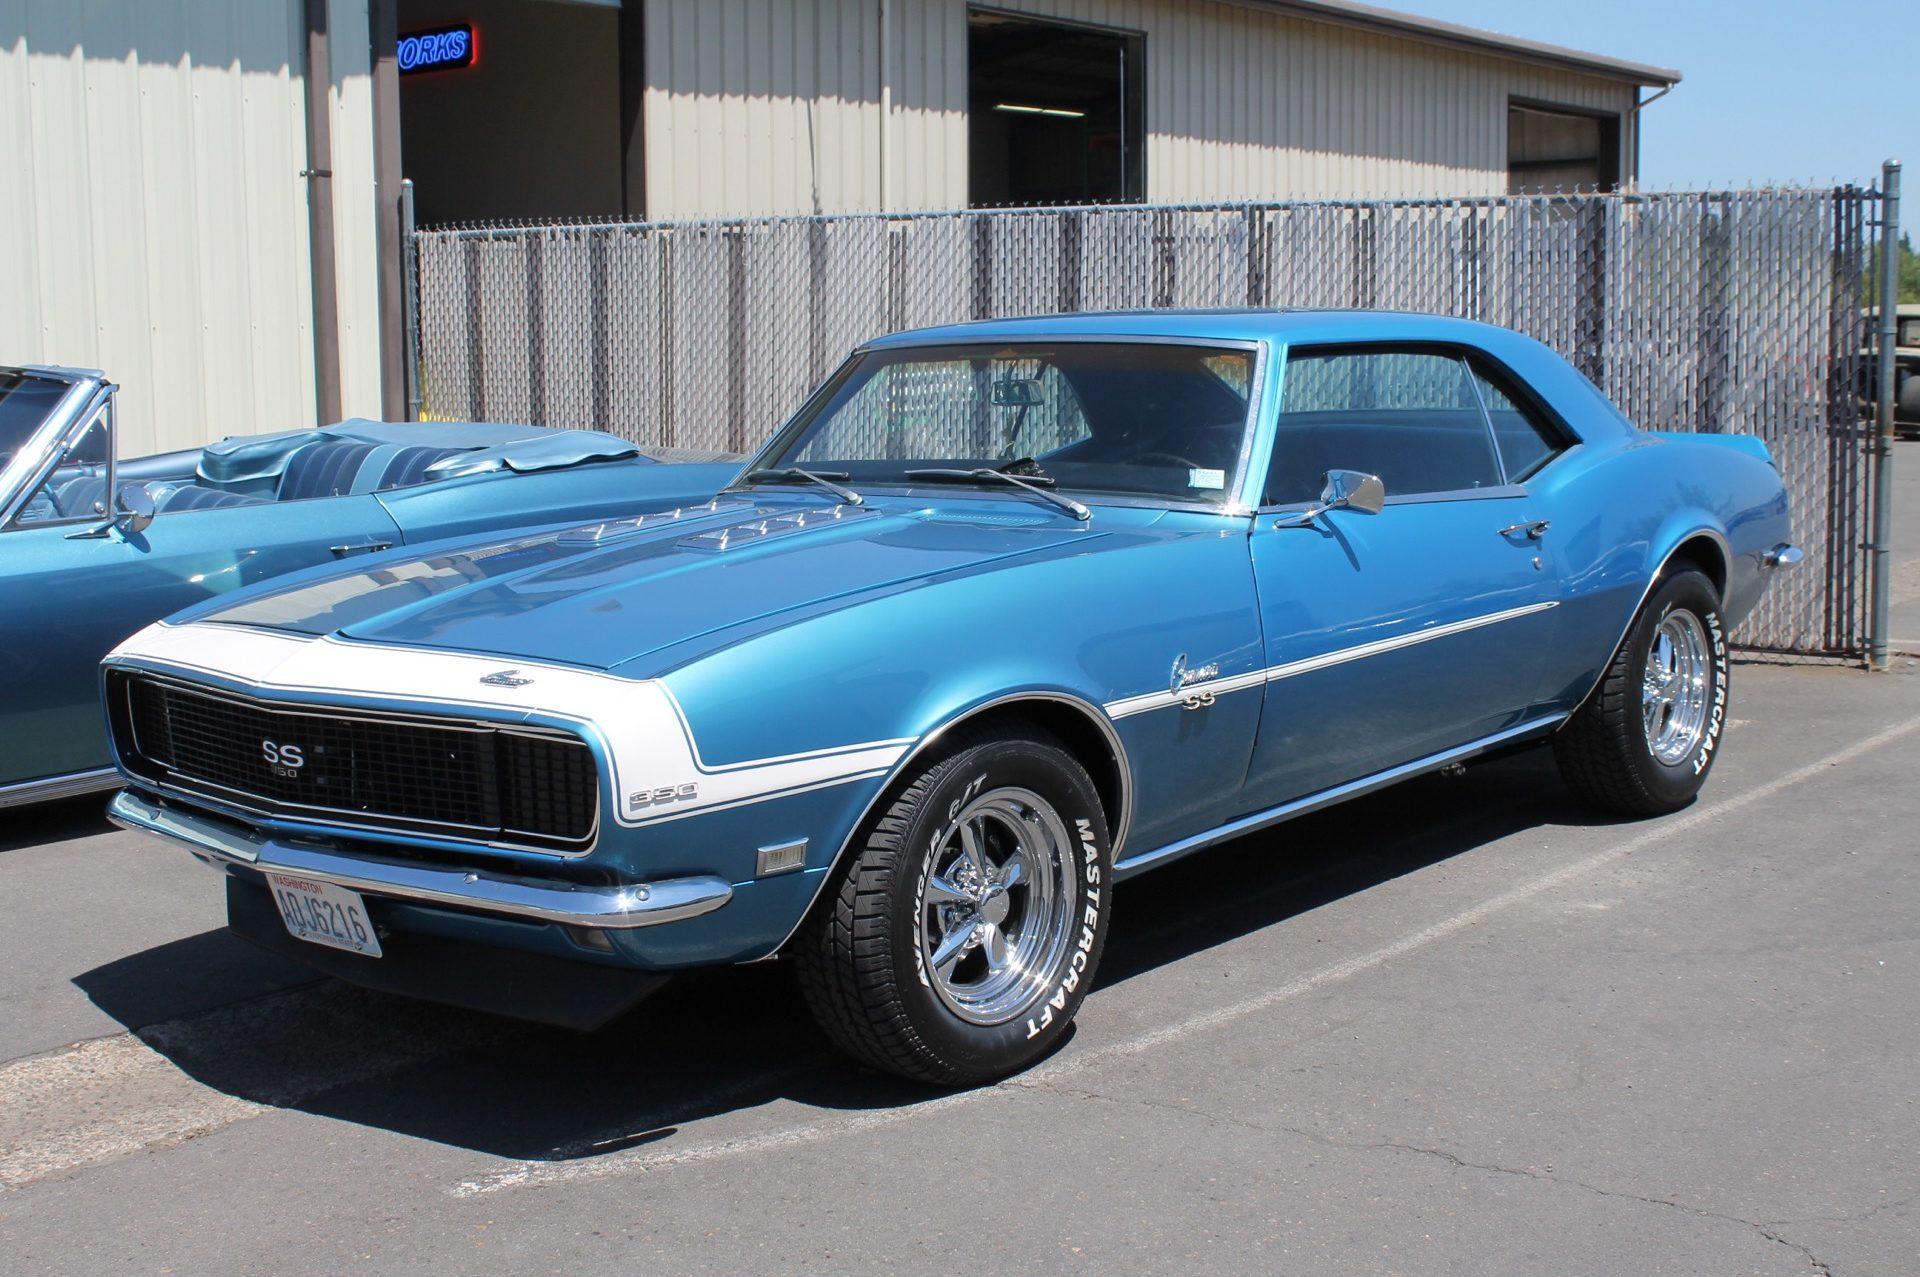 1968 Camaro - MetalWorks Classics Auto Restoration & Speed Shop